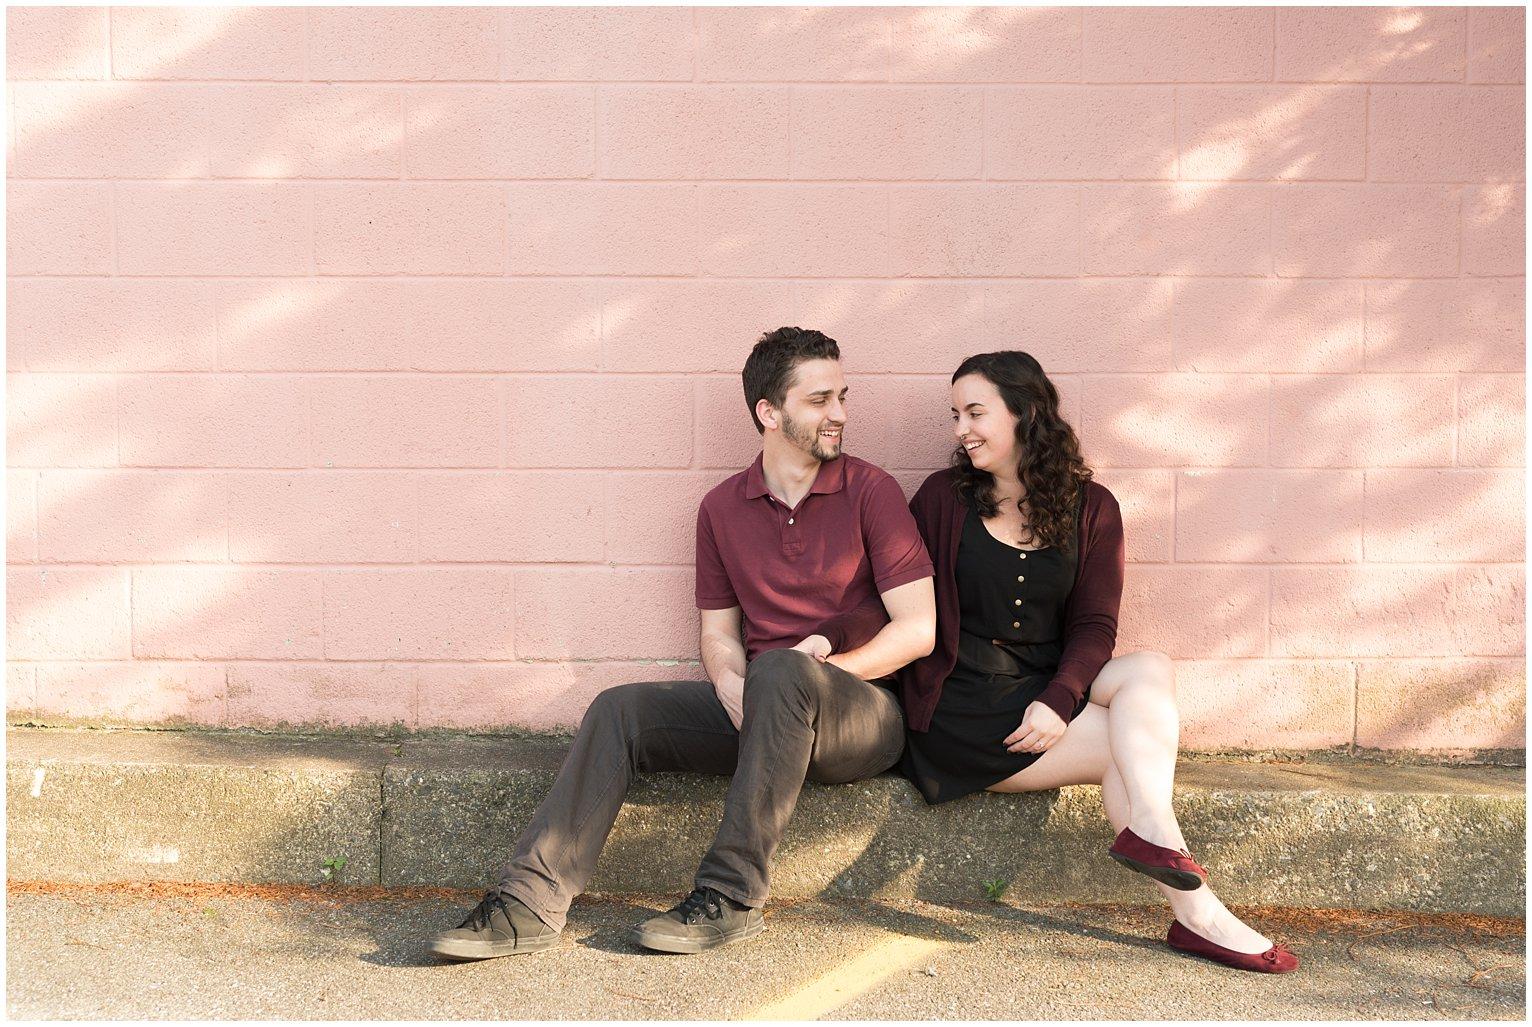 lancaster-city-wedding-photographer-pink-wall-photo